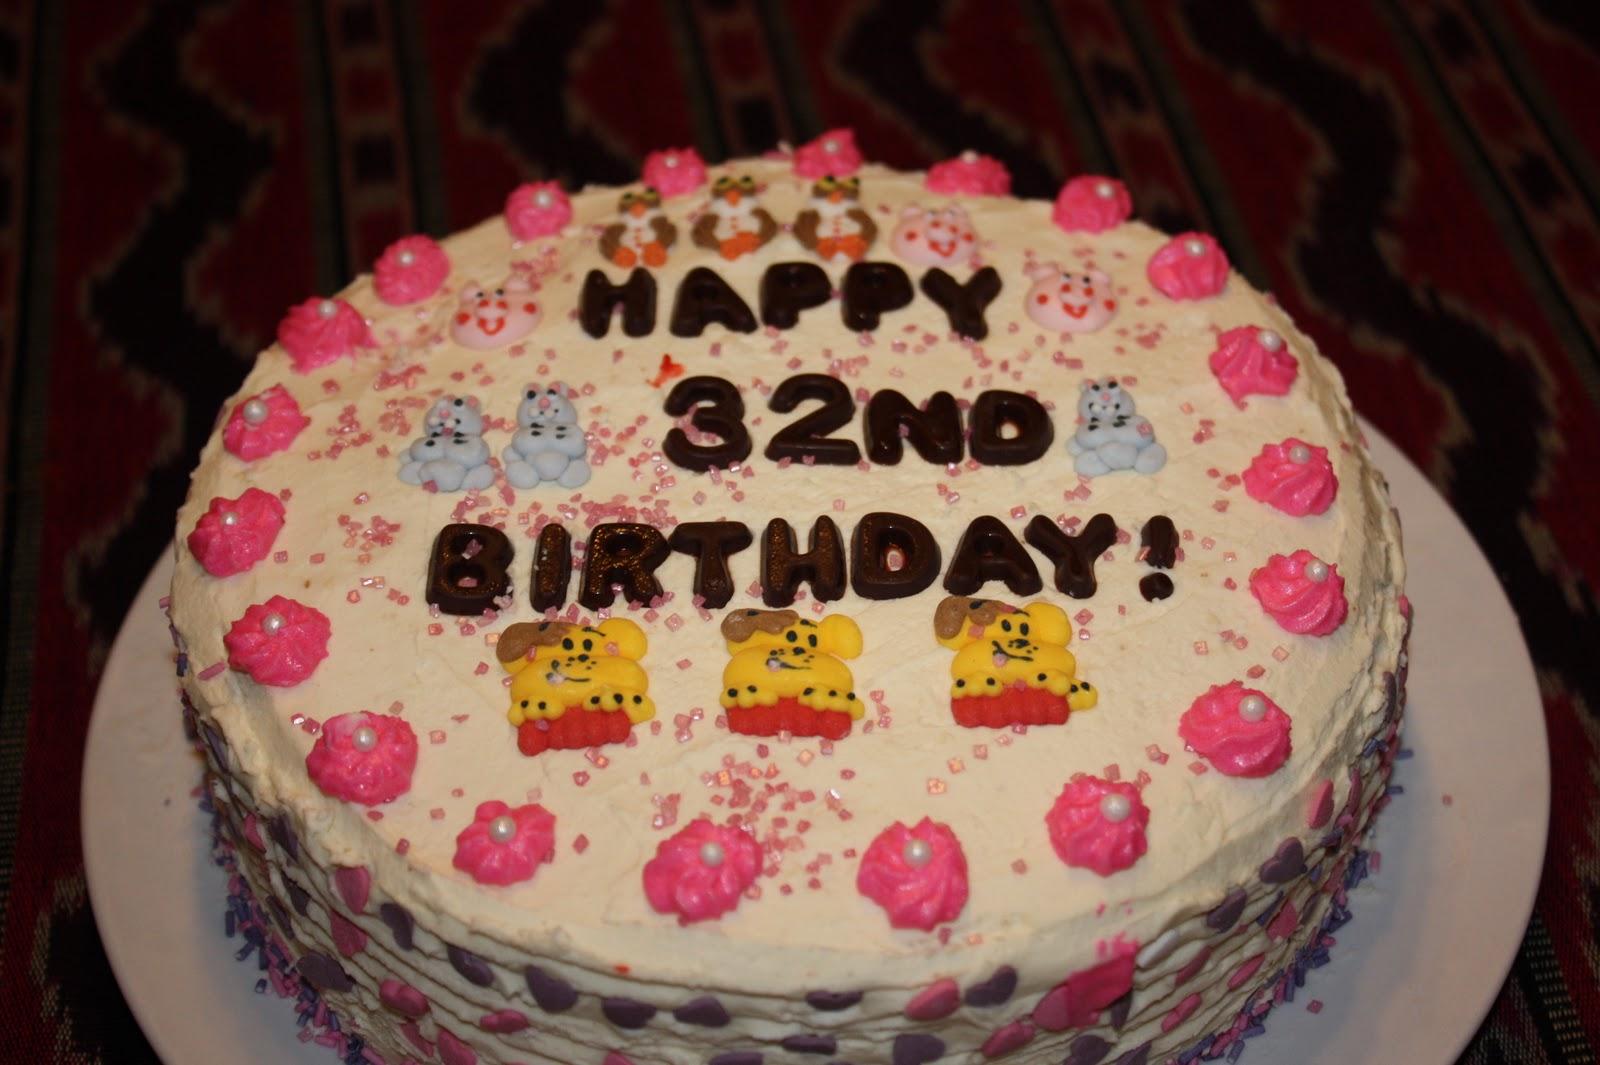 Happy Birthday The Gunslinger45 Movie Forums